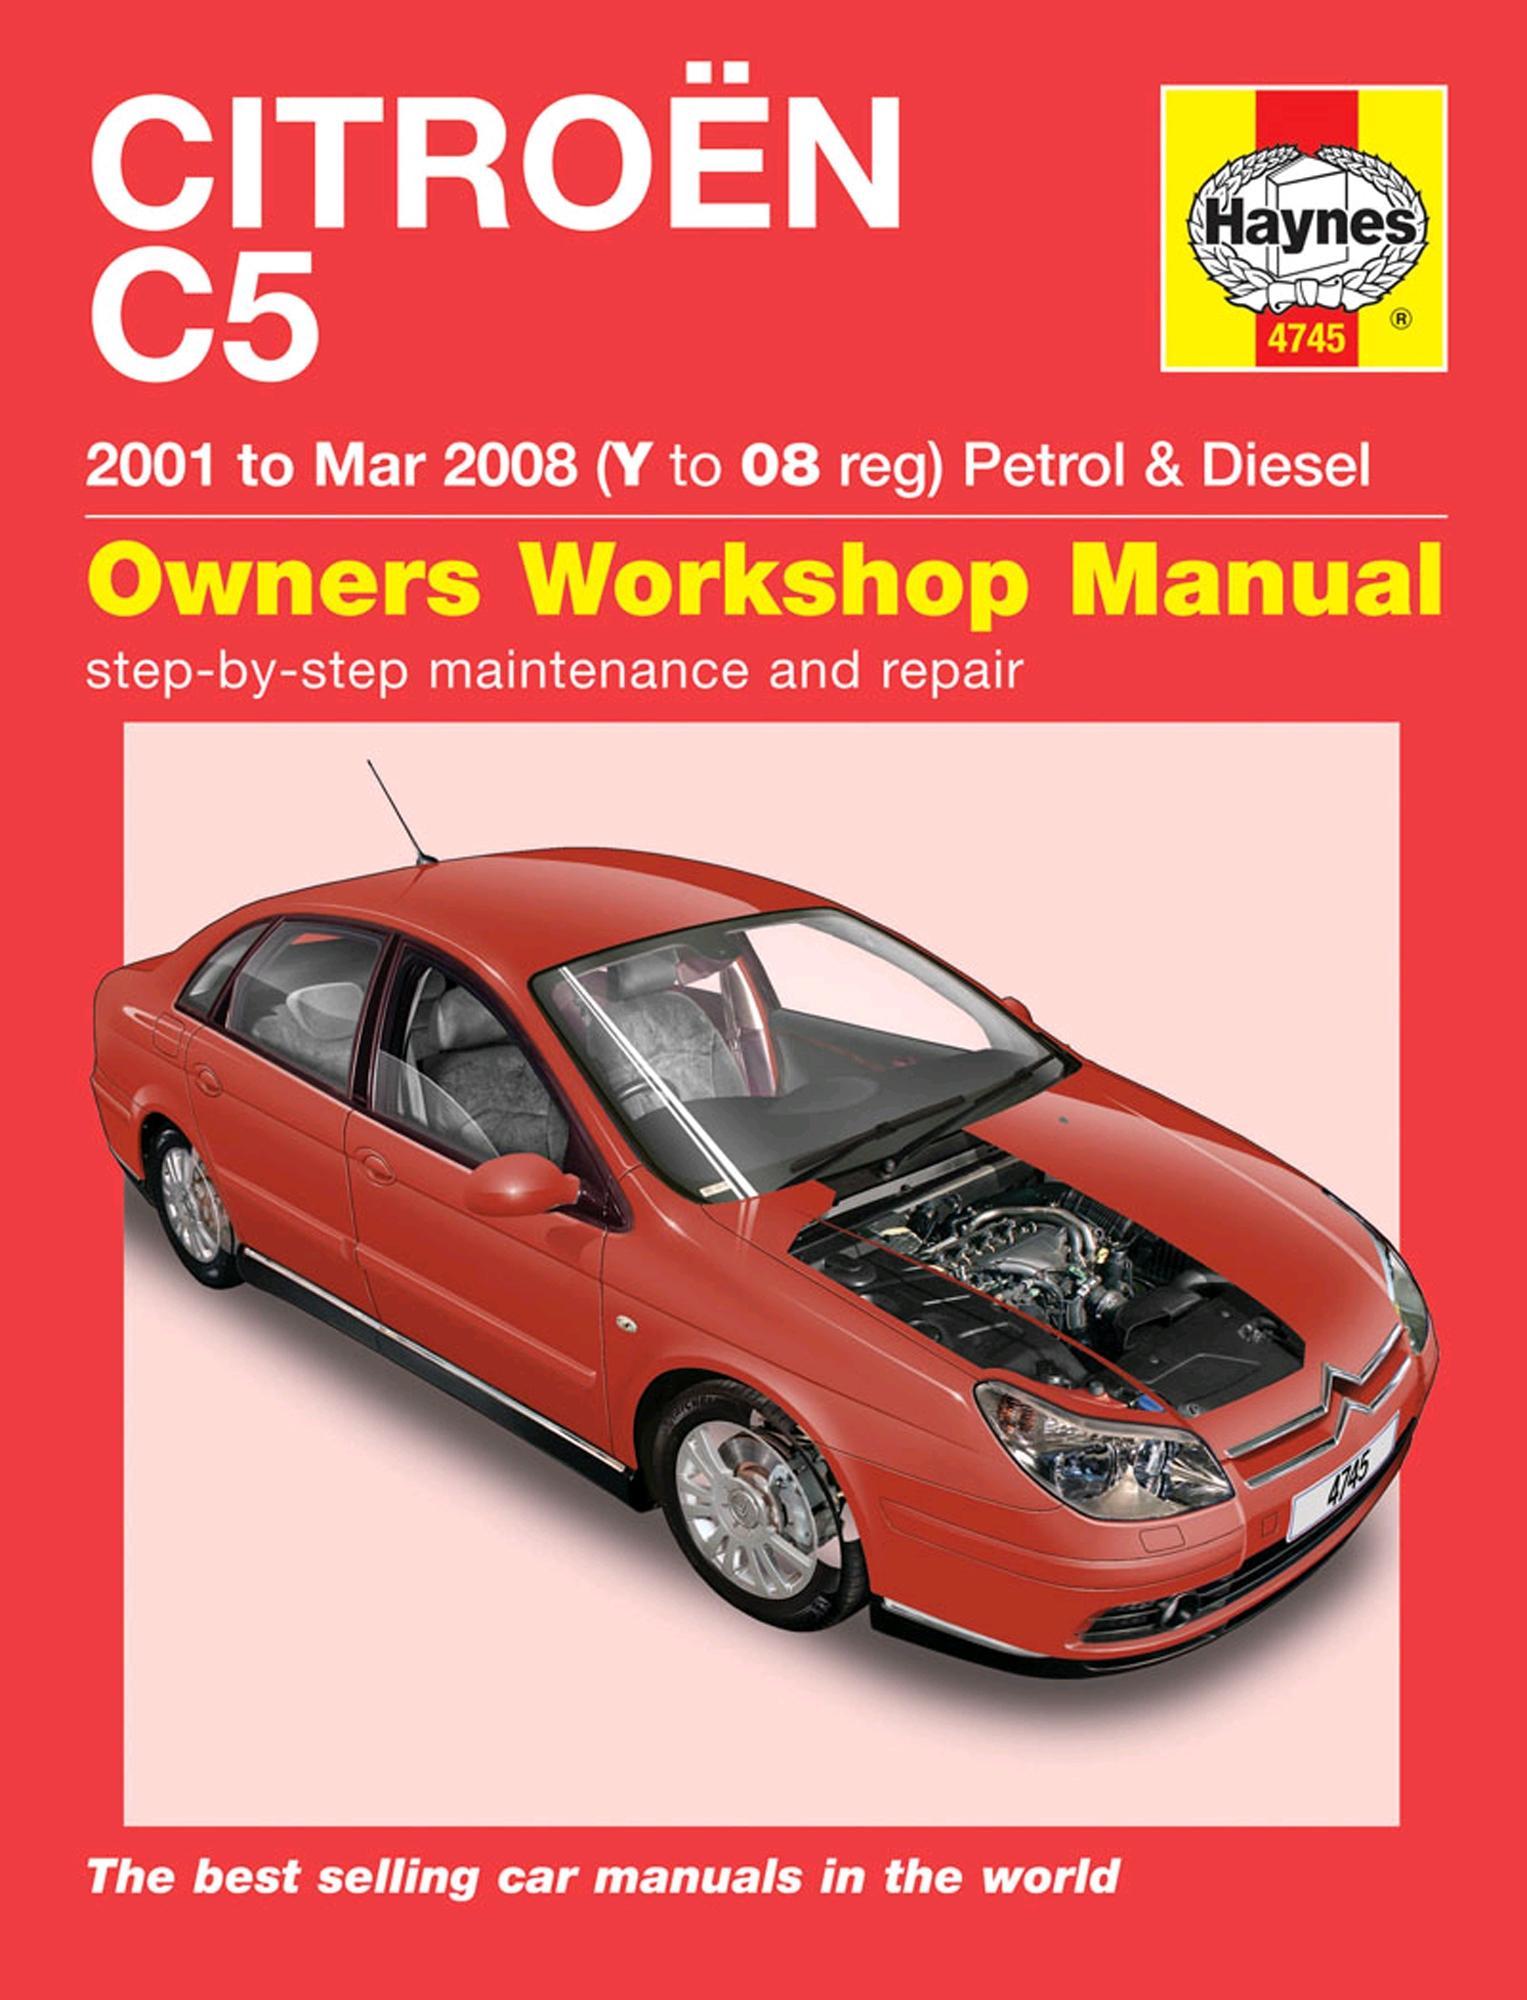 haynes citroen c5 01 to mar 08 ma rh halfords com citroen c5 owners manual 2006 citroen c5 owners manual 2001